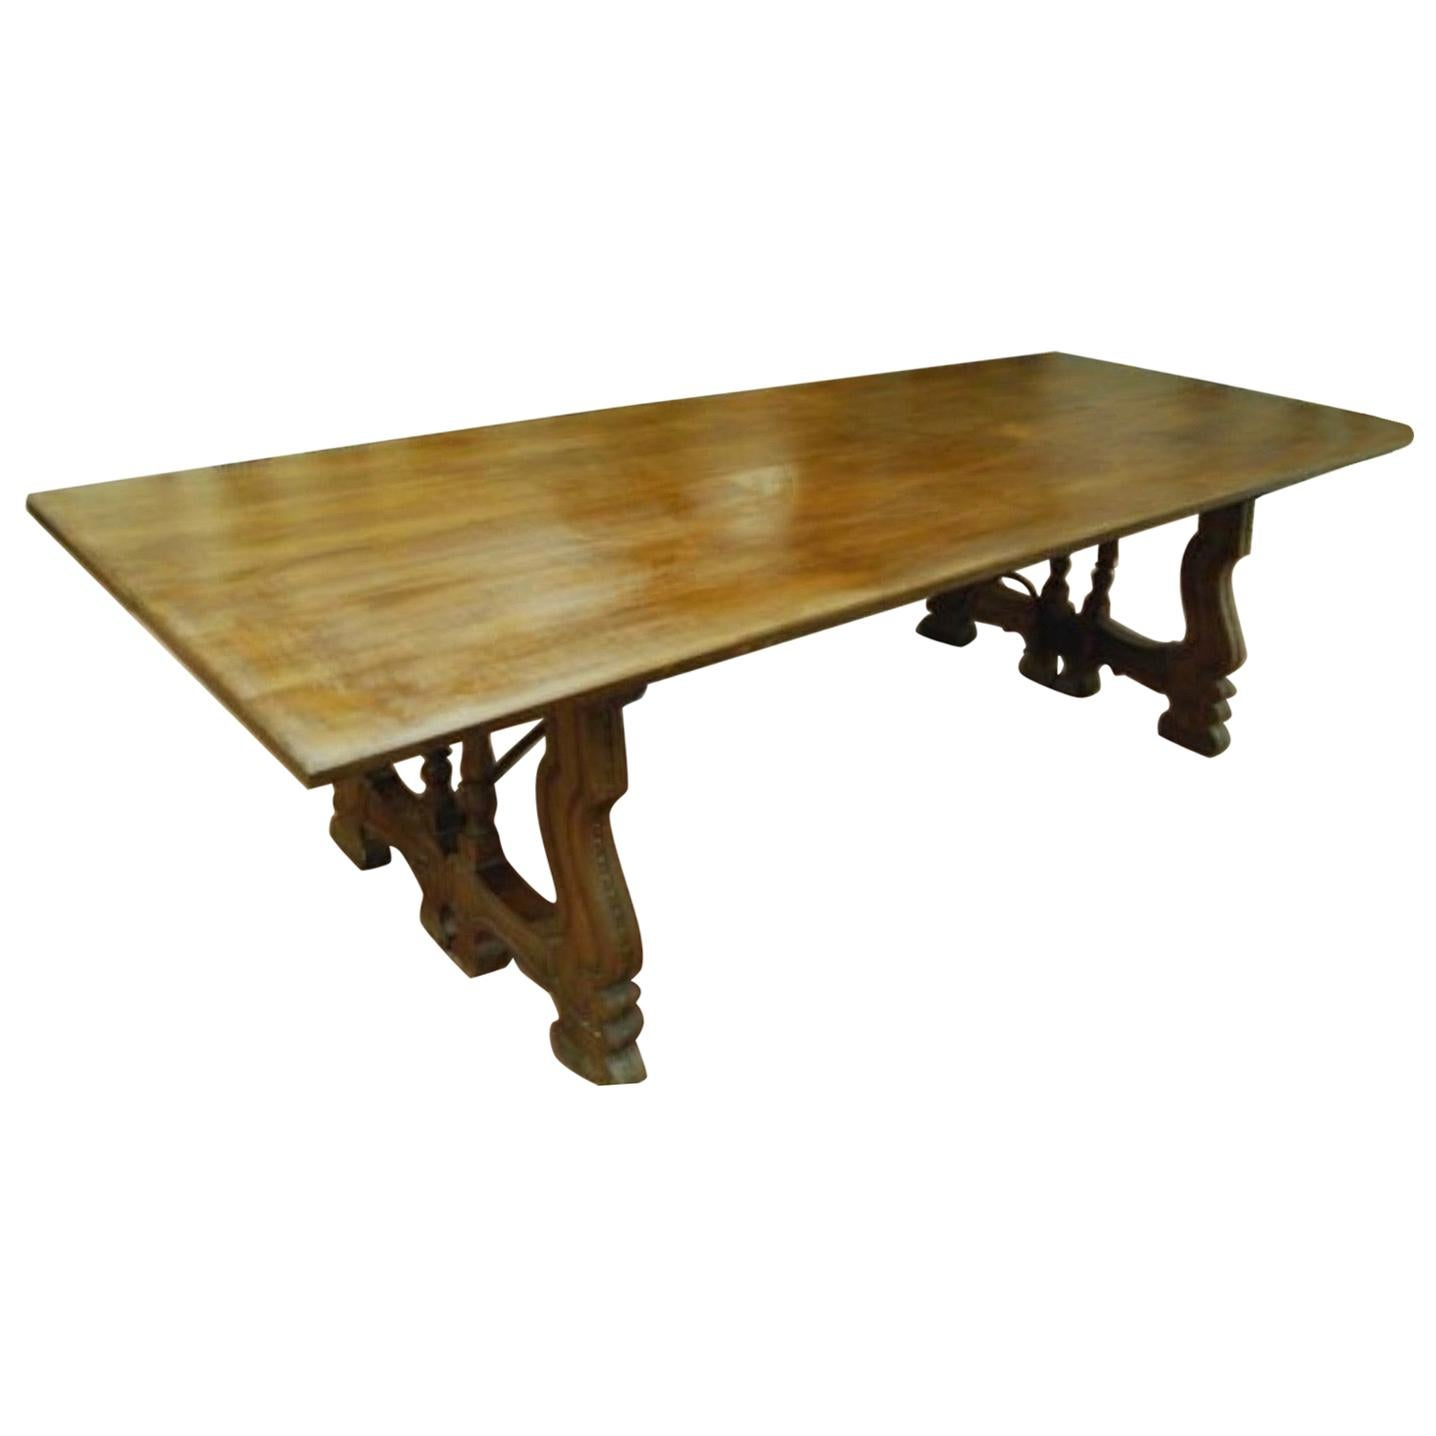 19th Century Spanish Baroque Style Walnut Folding Trestle Dining Farm Table